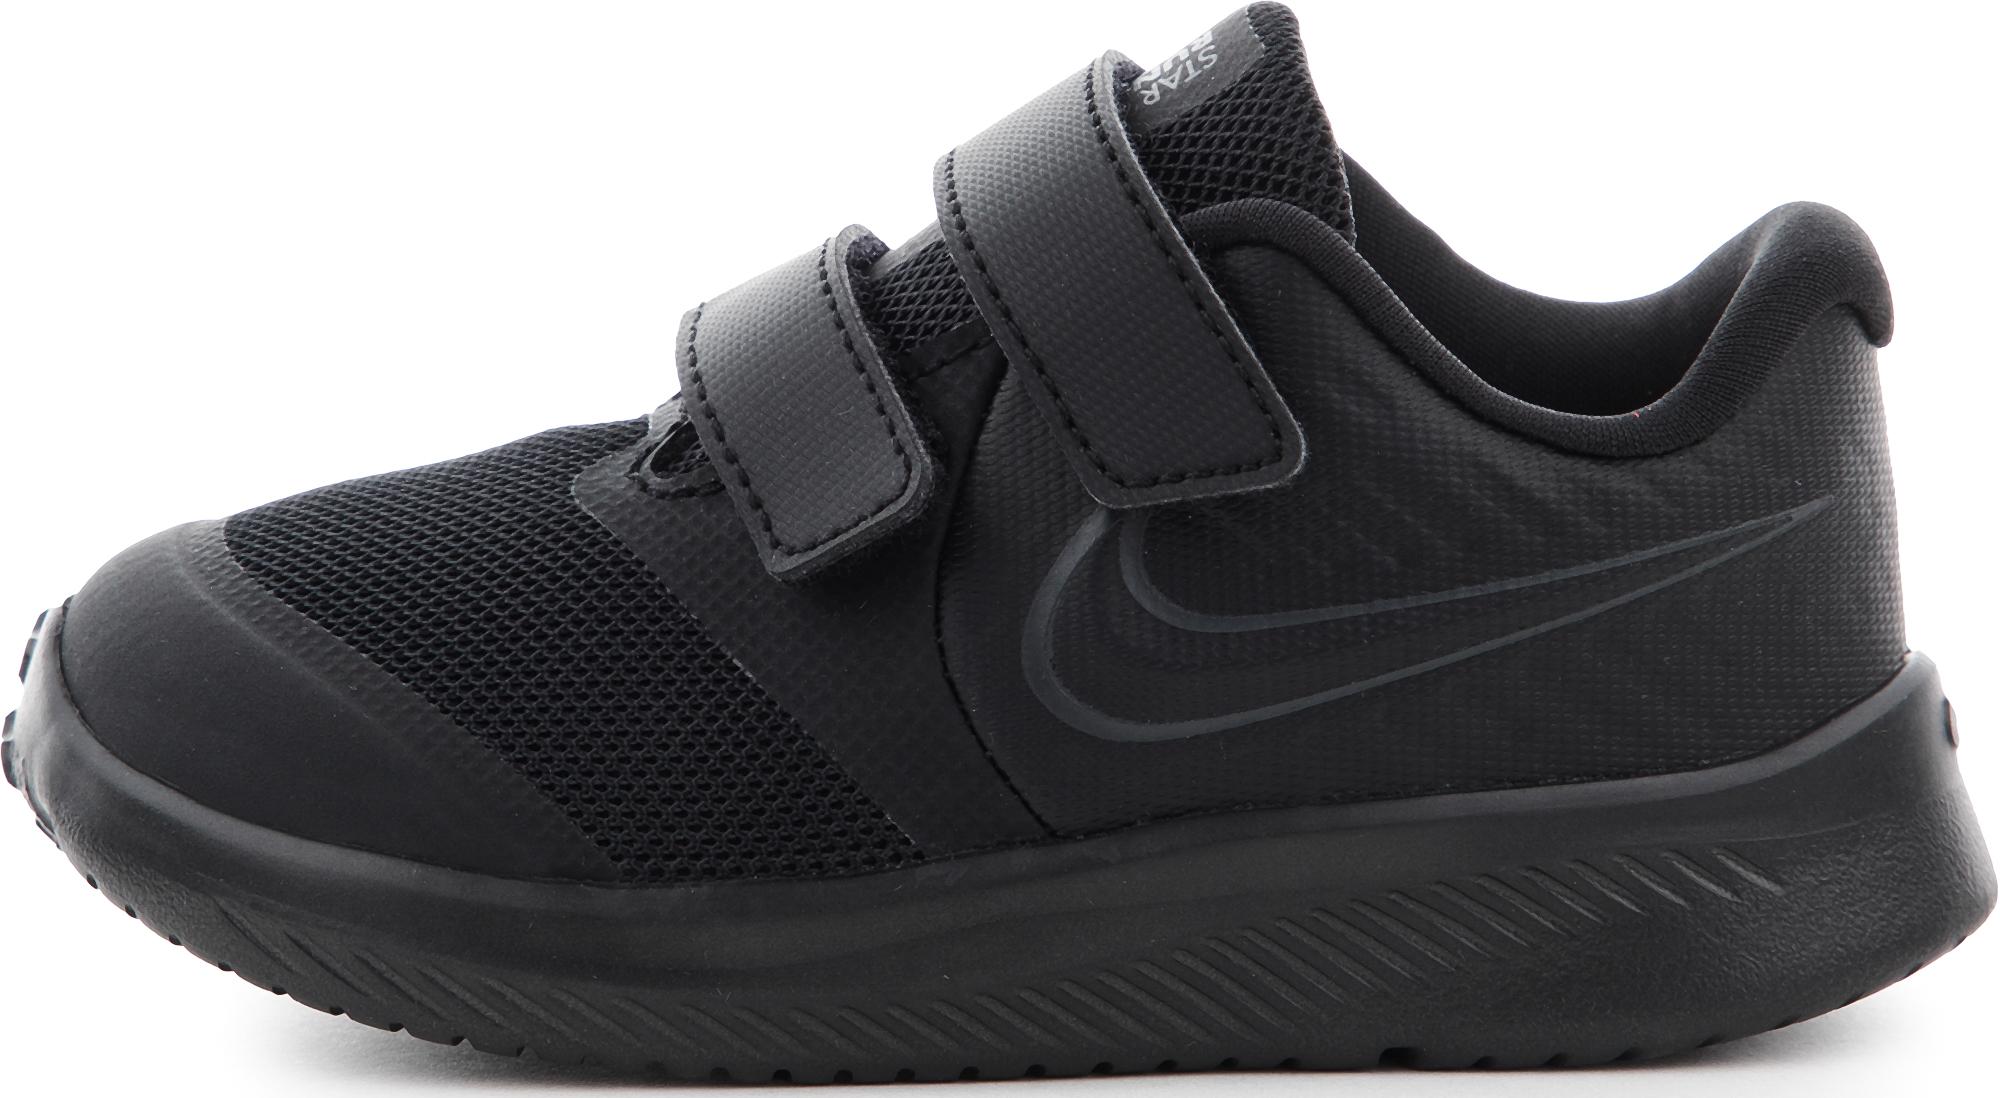 Nike Кроссовки для мальчиков Nike Star Runner 2, размер 22,5 nike кроссовки для мальчиков nike lunar hayward размер 37 5